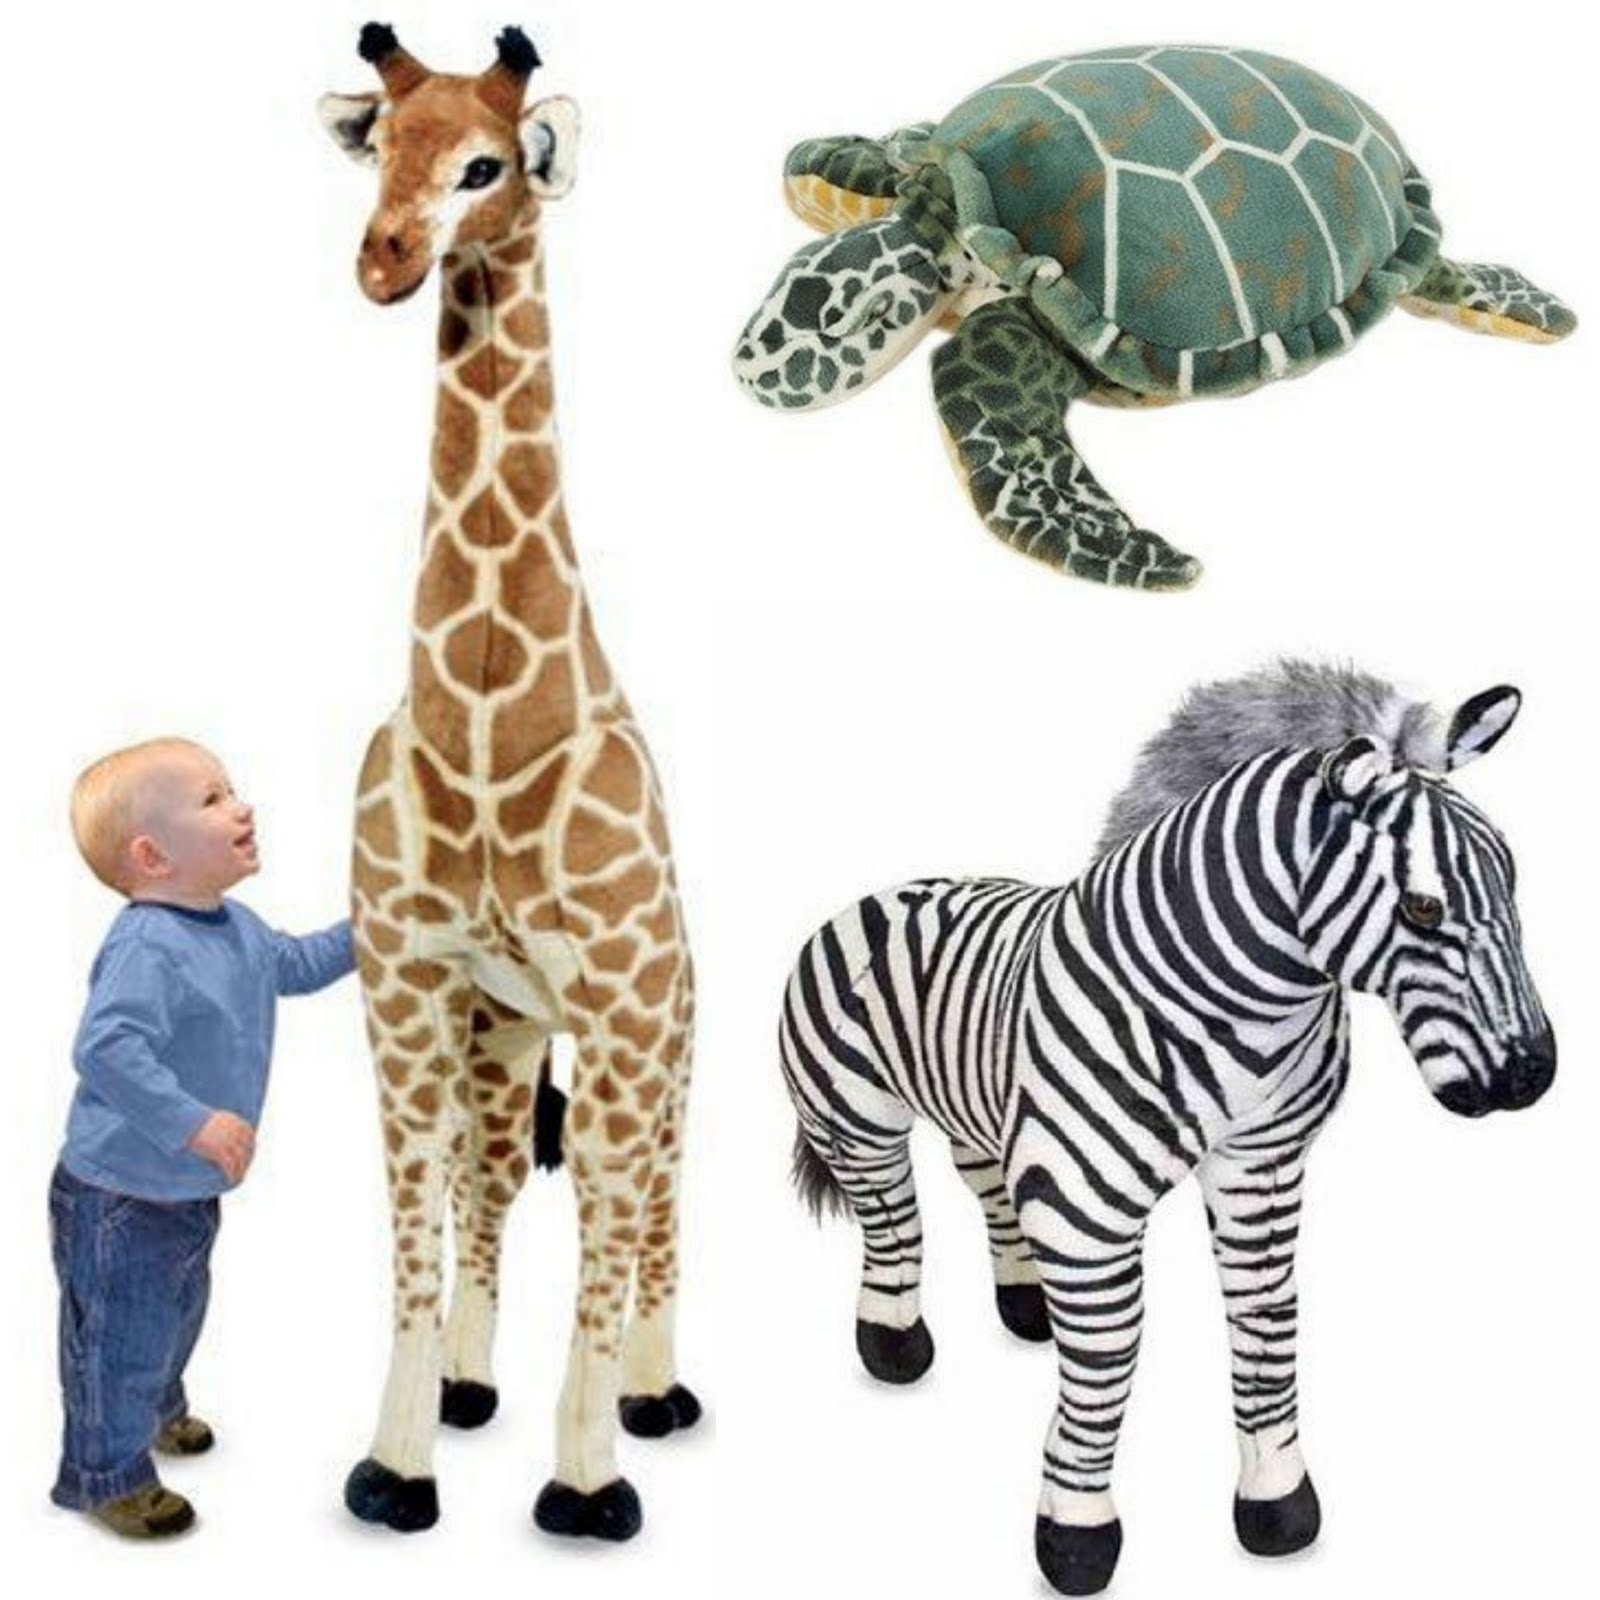 Baby Essentials Giant Stuffed Animals